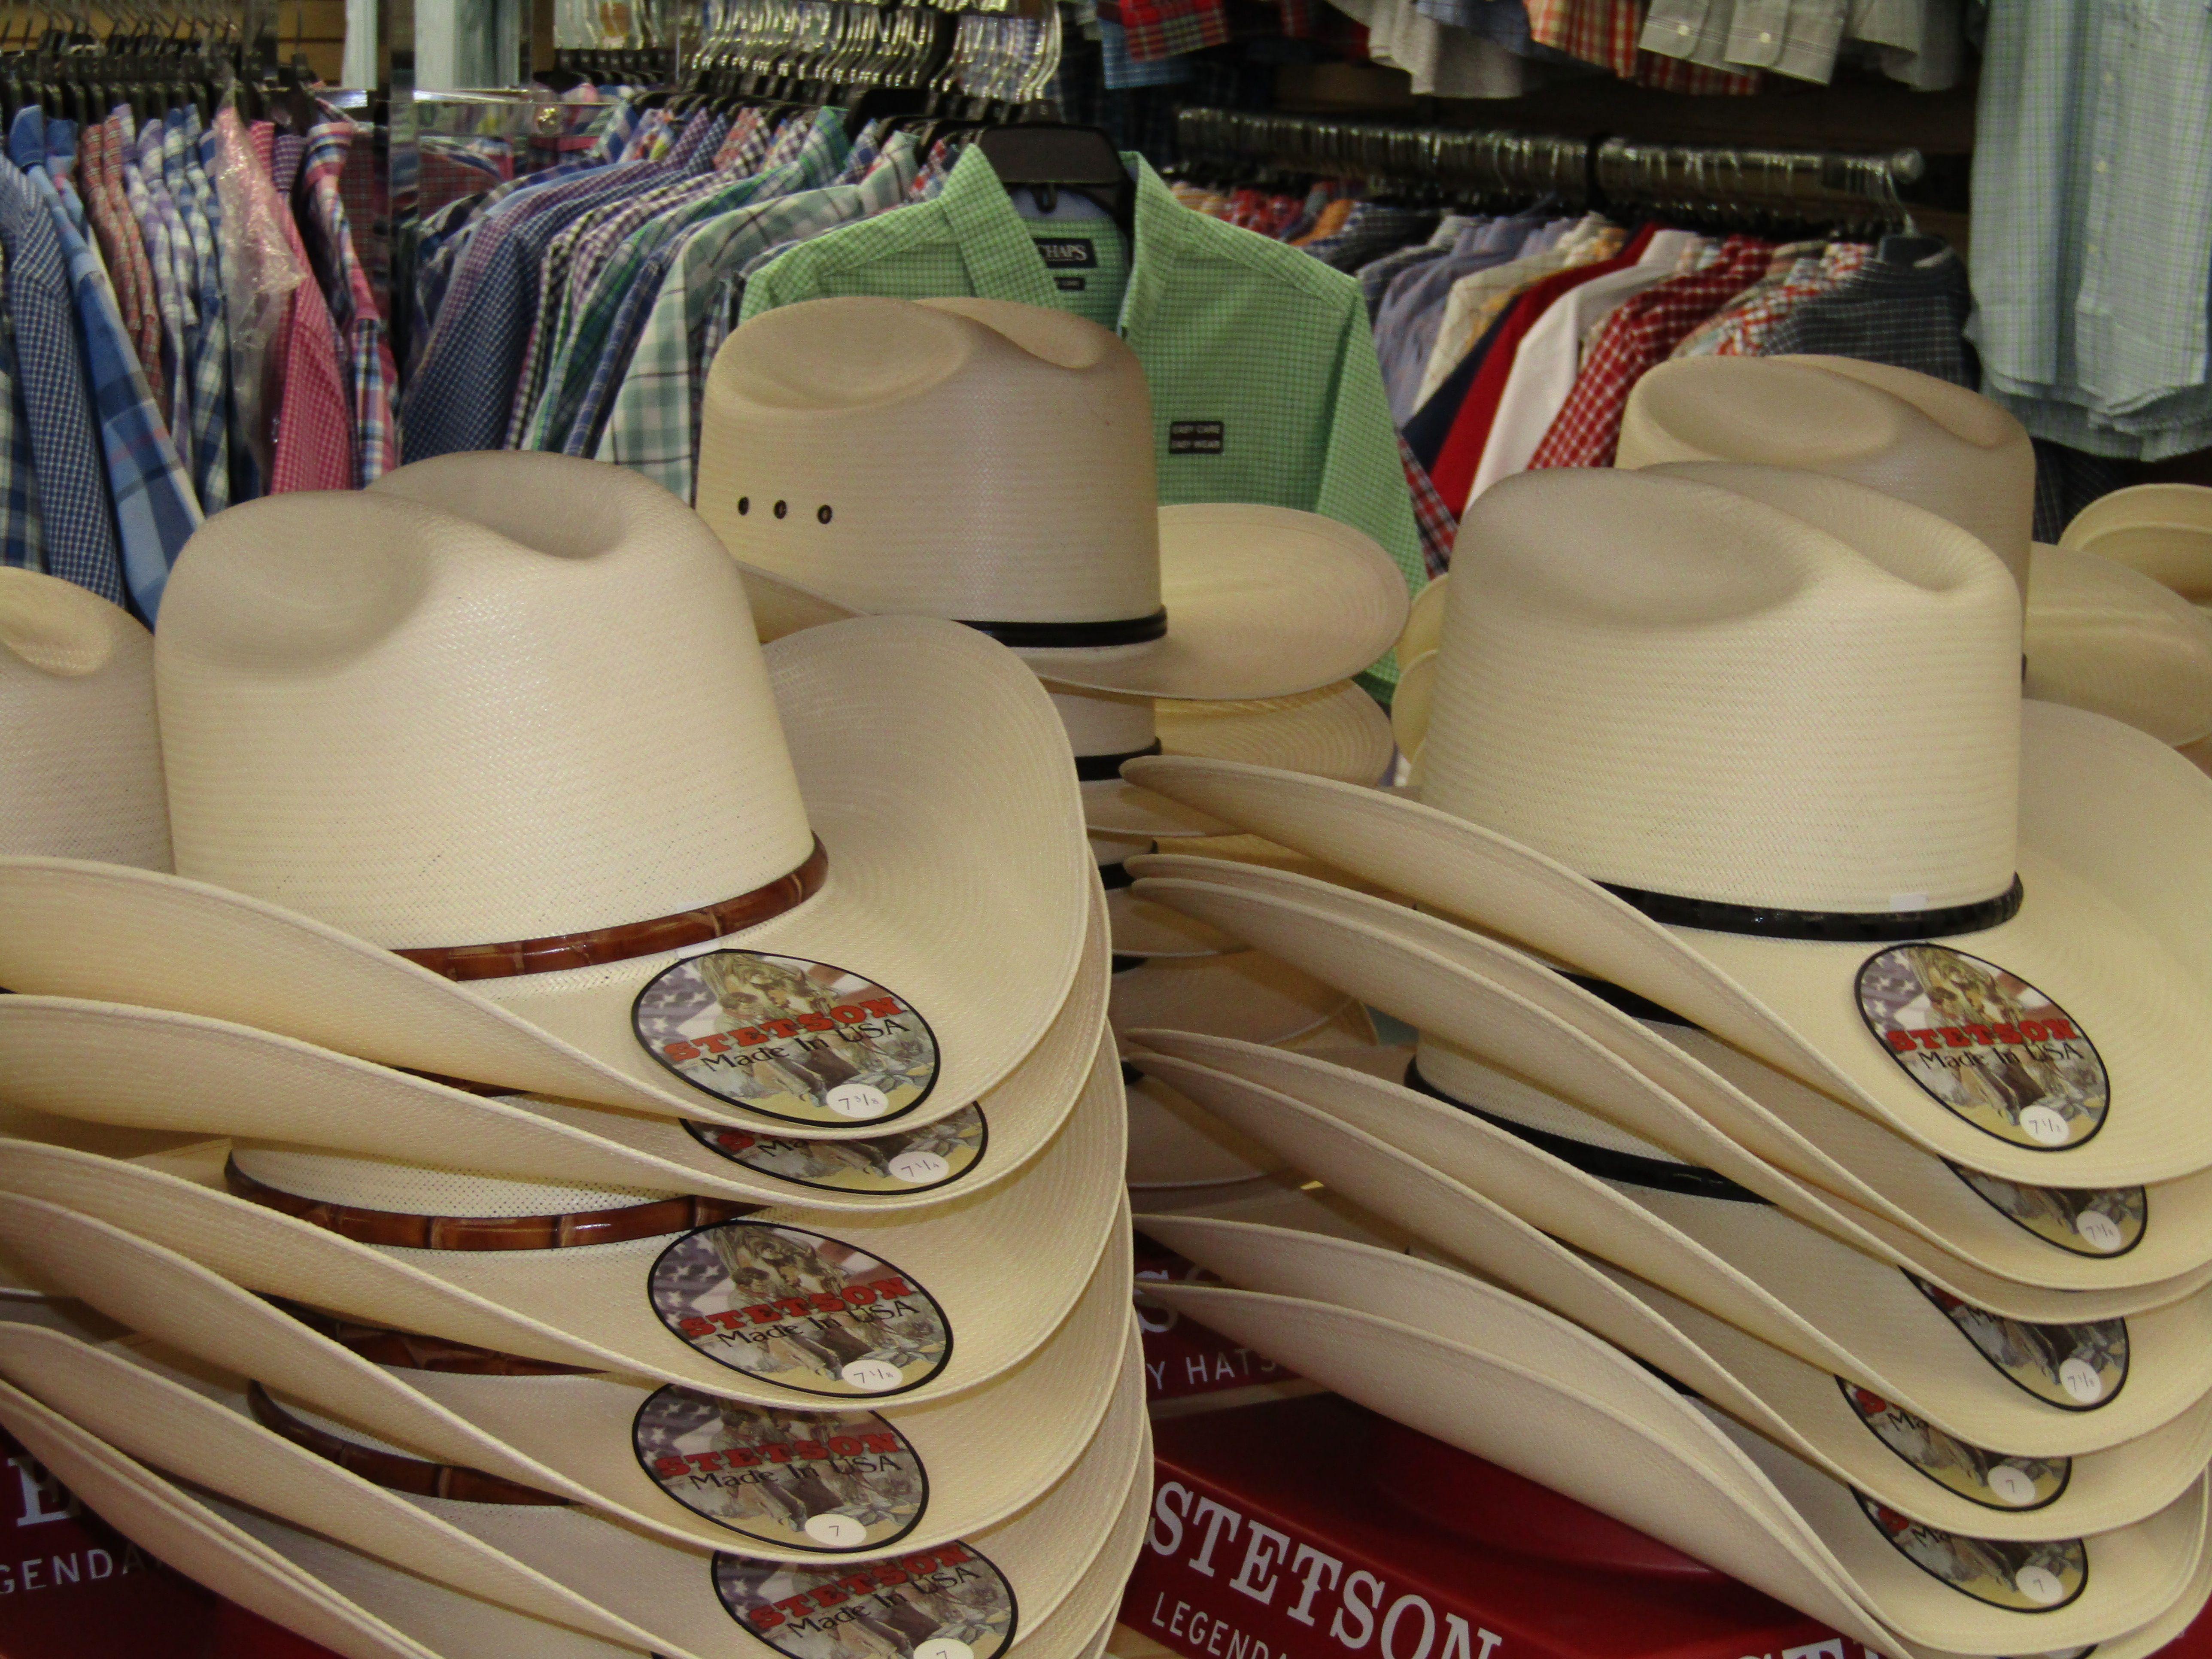 Casa Raul 1102 Grant St In Downtown Laredo Laredo Texas Cowboy Outfits Cowboy Gifts Laredo